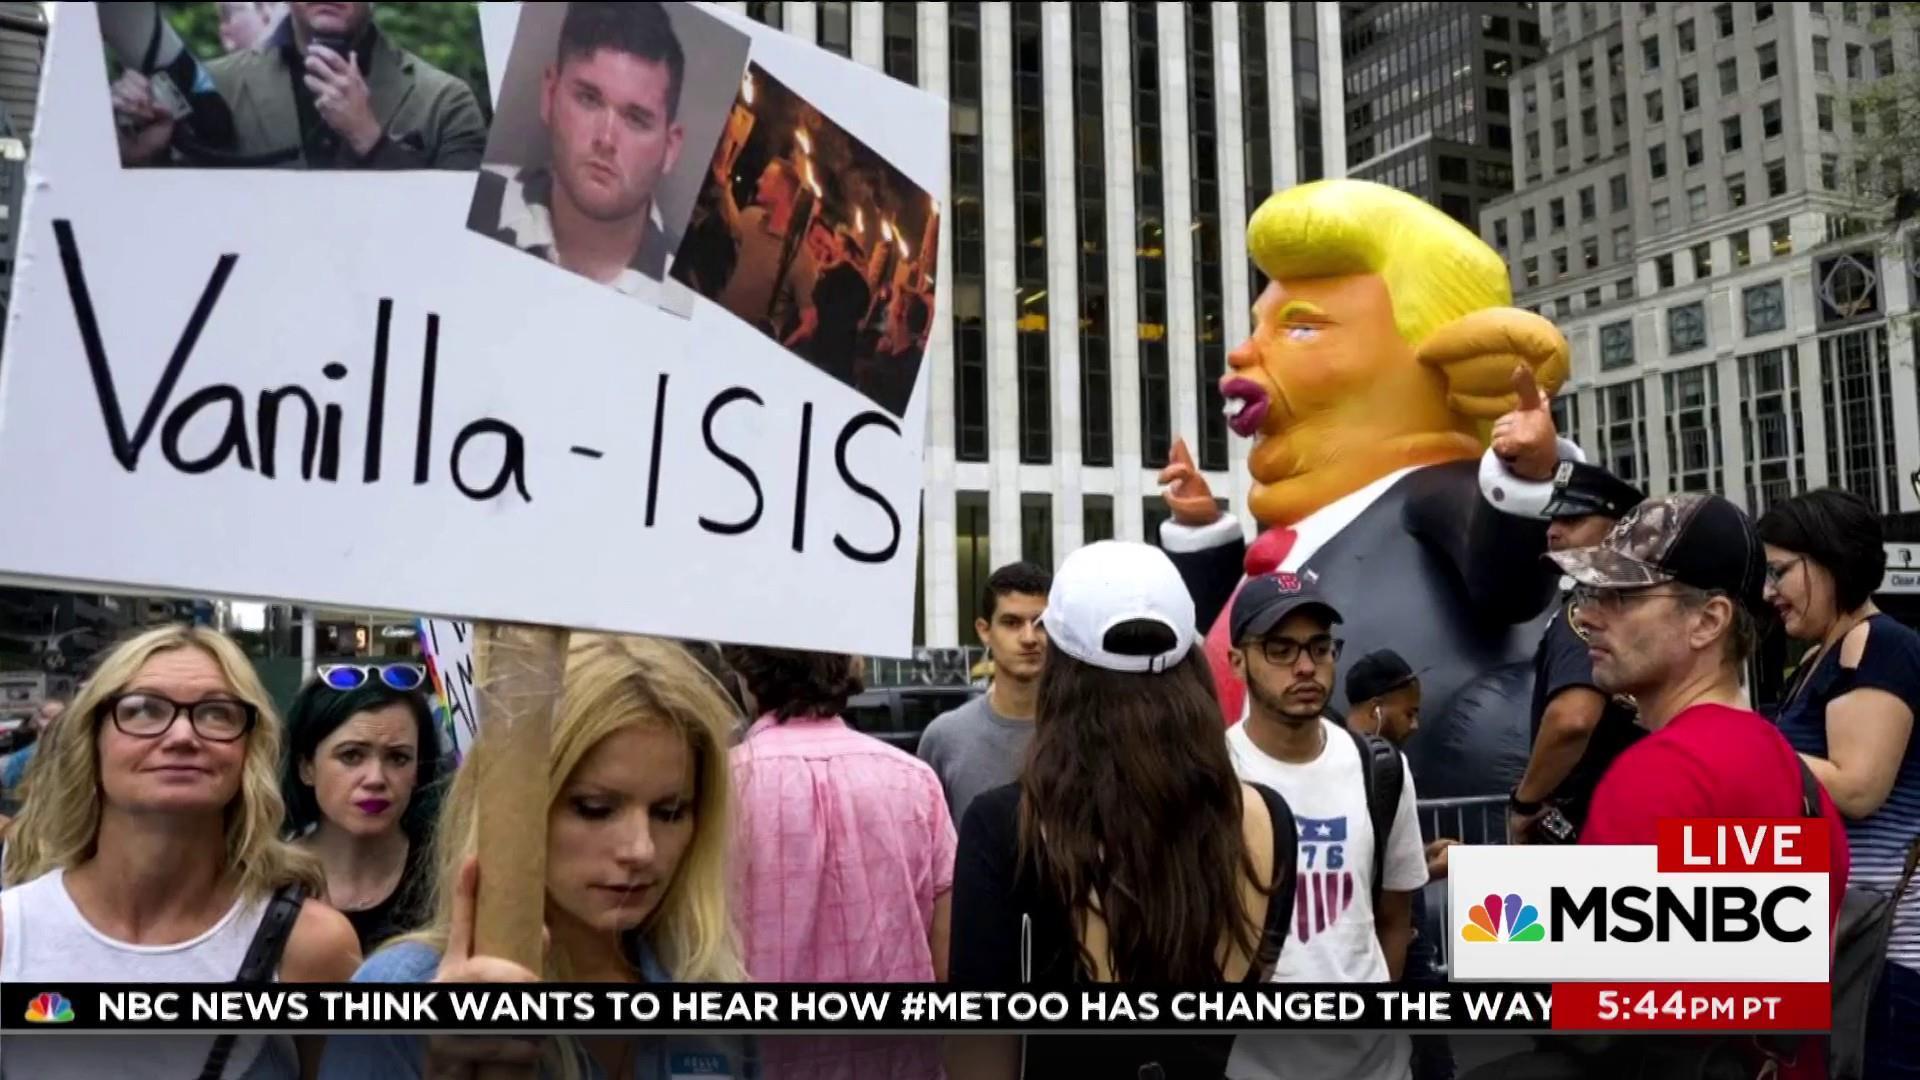 Trump gets mocked for his parade idea